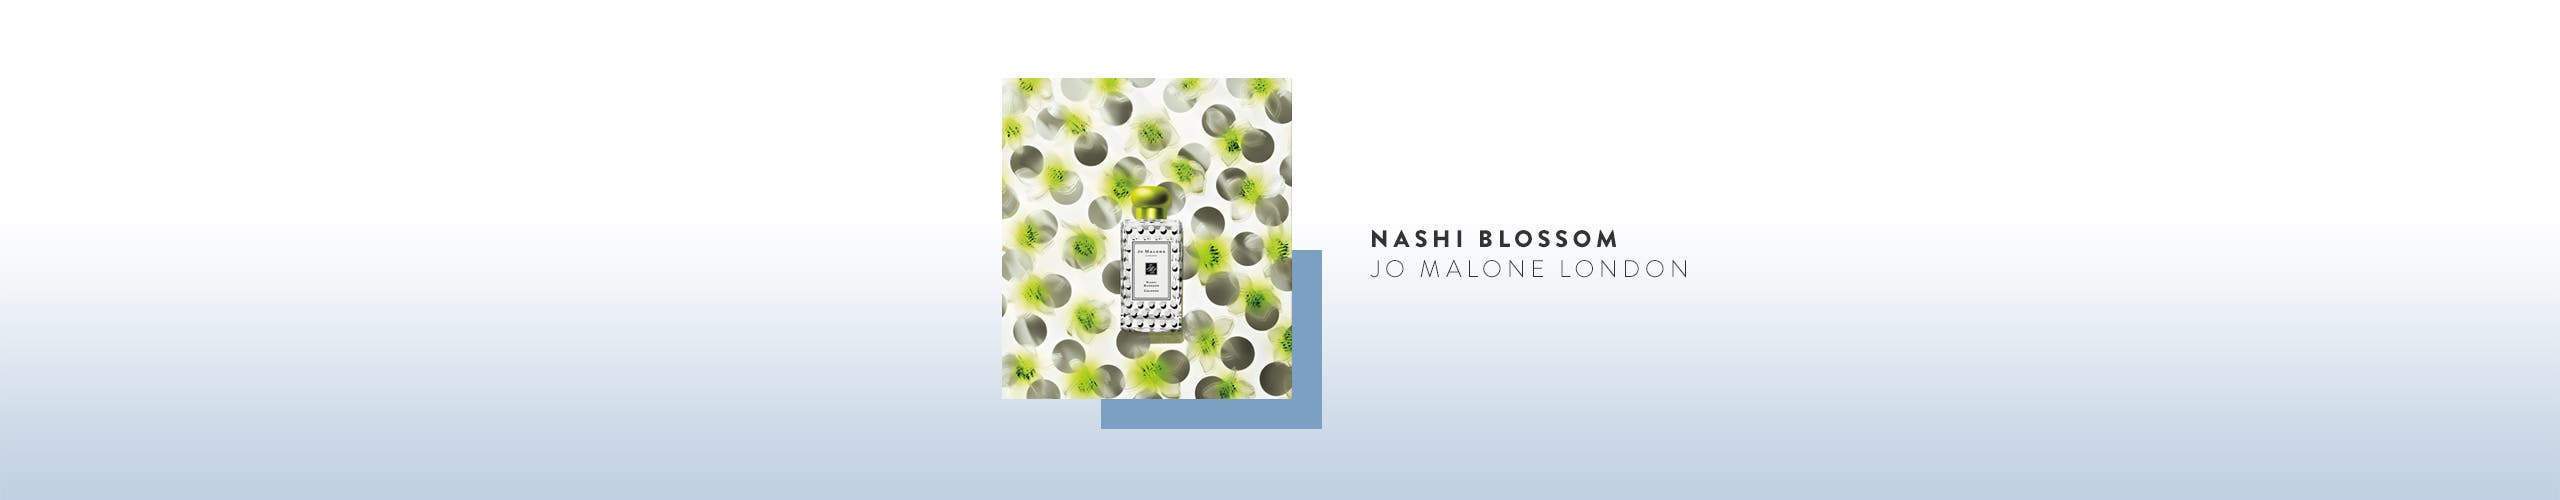 Nashi Blossom by Jo Malone London.